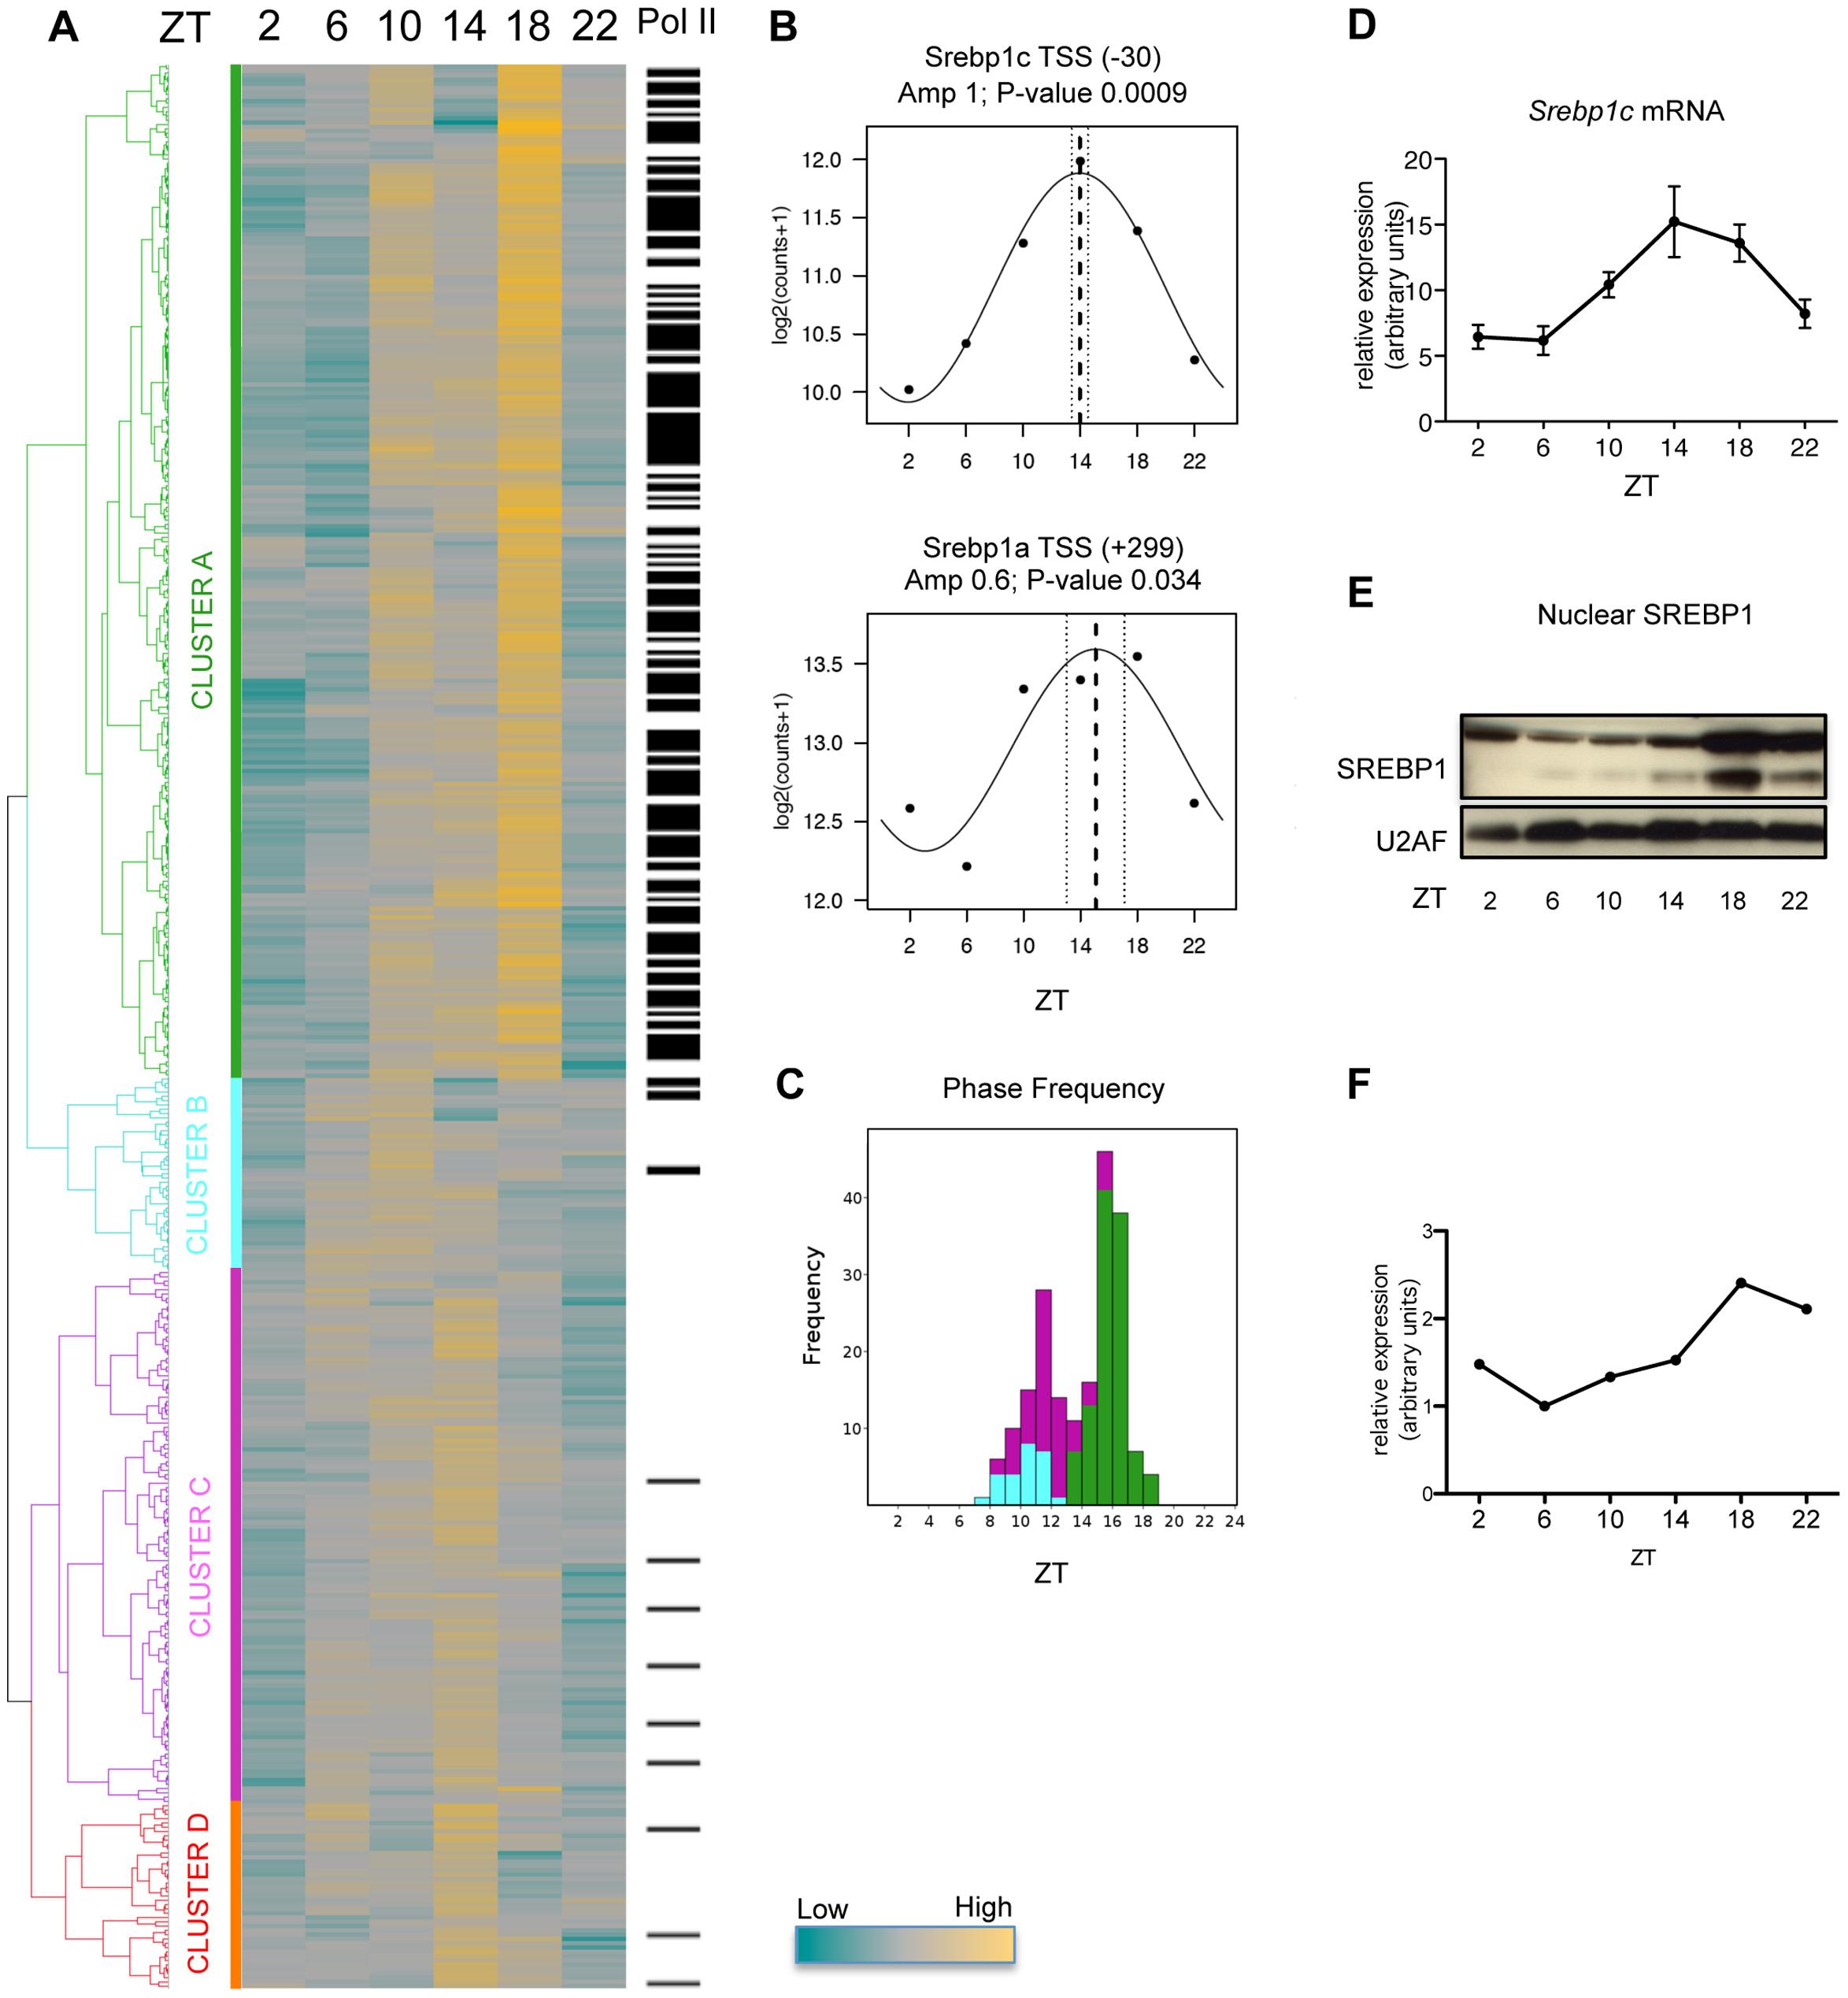 Dynamics of SREBP1 binding.